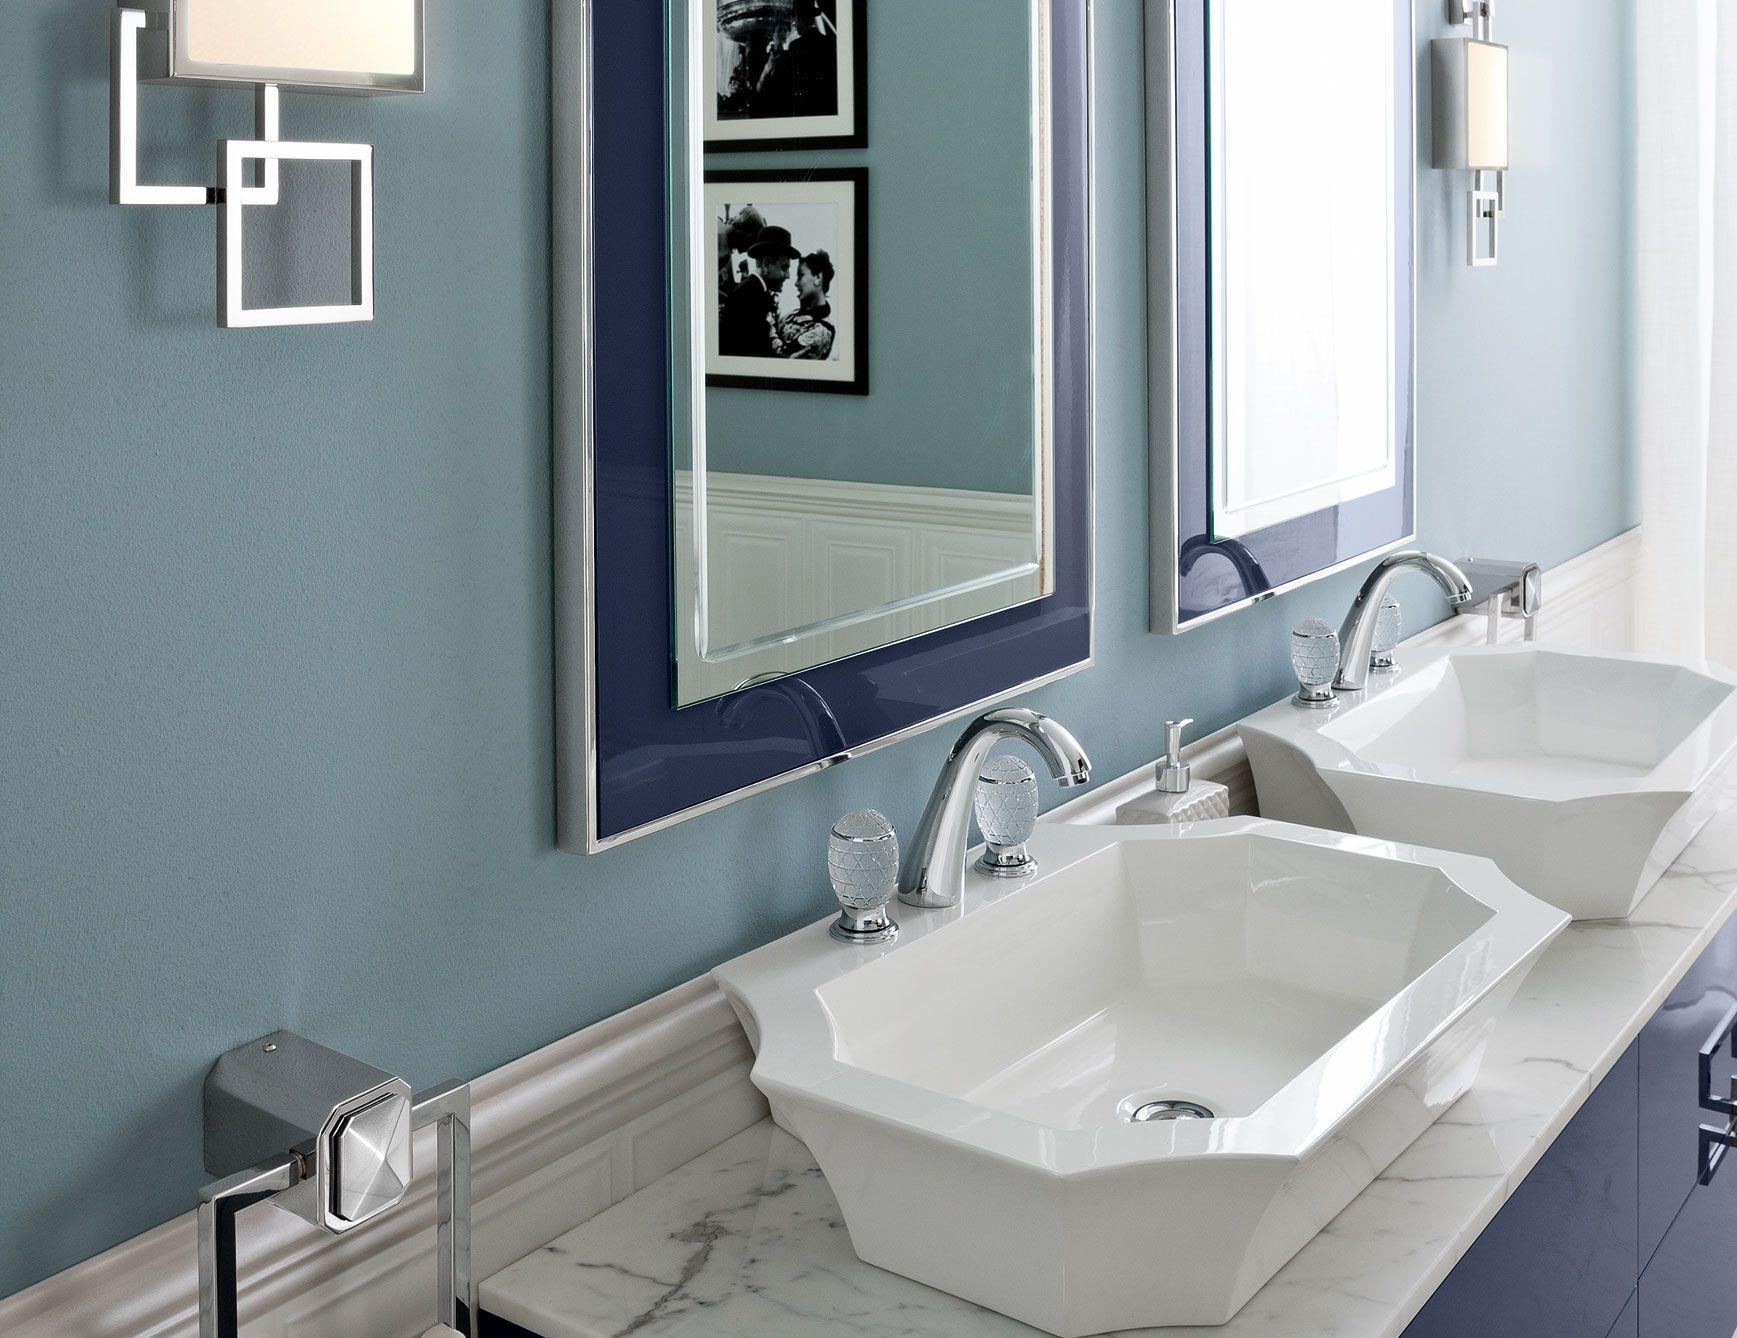 High end Italian bathroom furniture shown in 69.3\